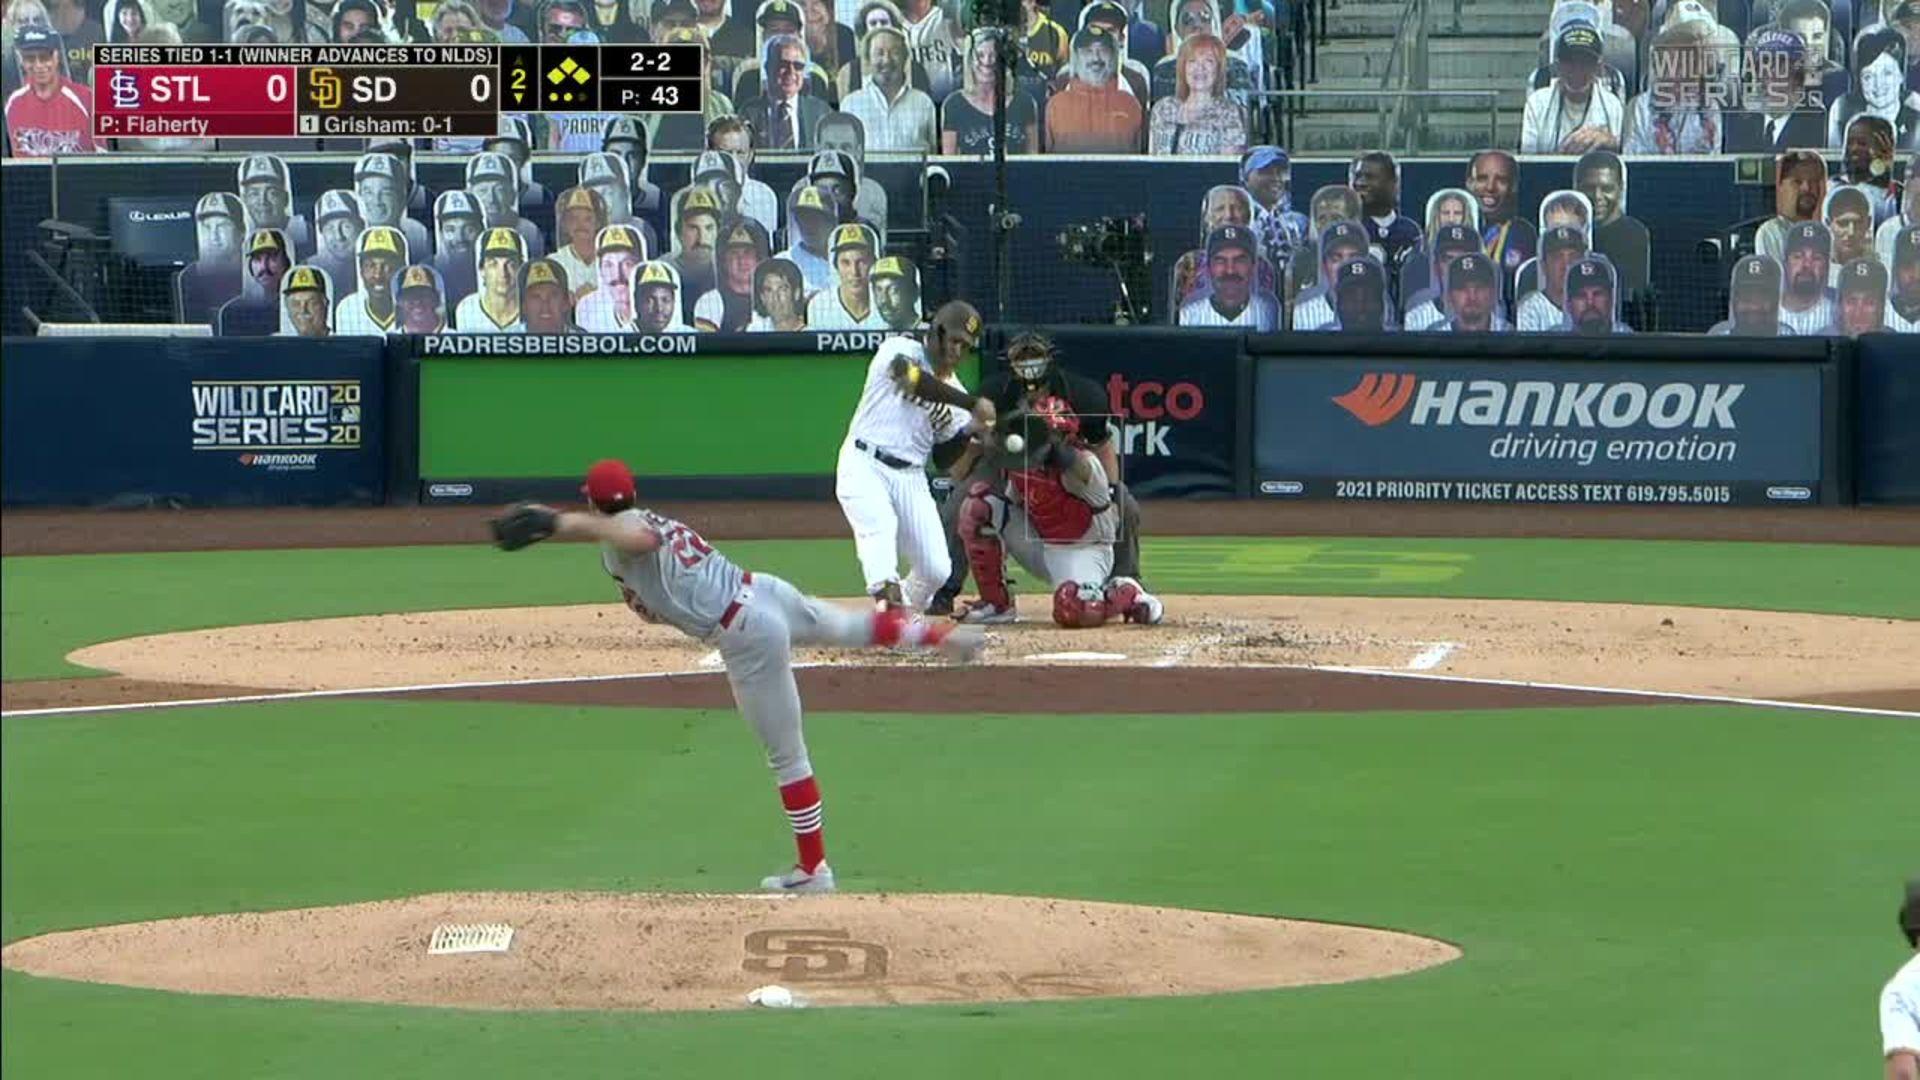 Credit: MLB